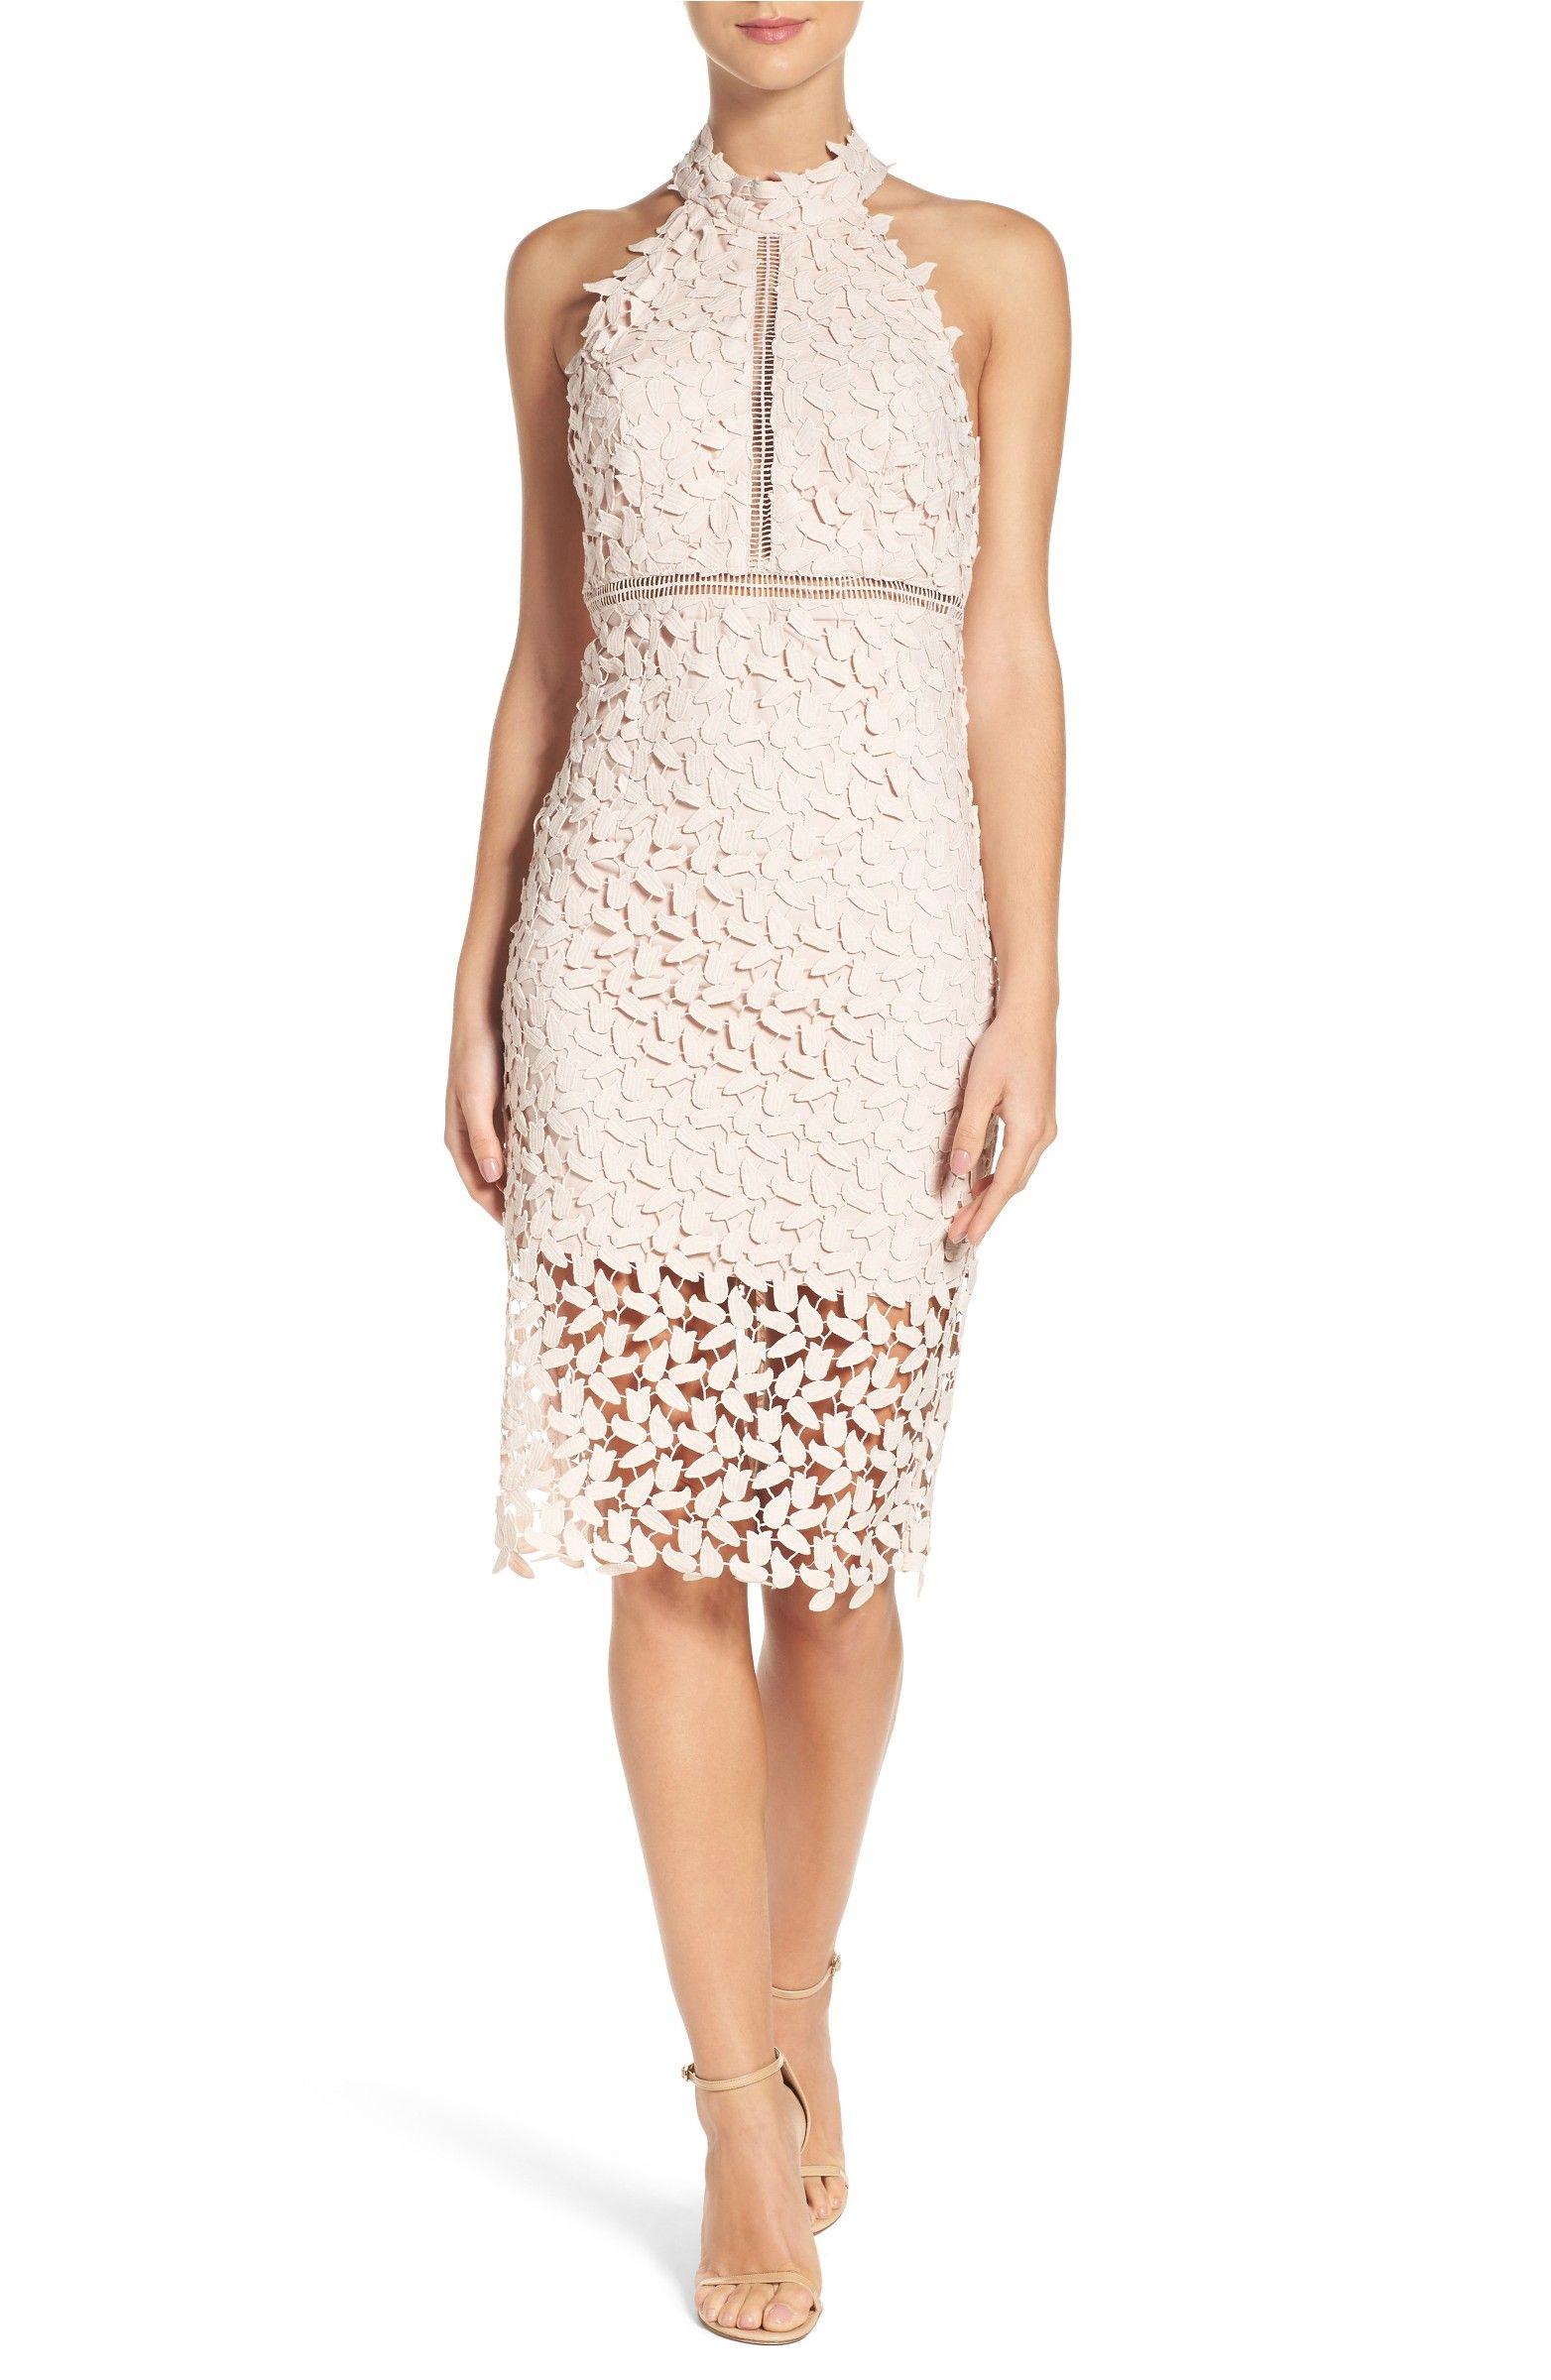 30c3c08e46 Main Image - Bardot 'Gemma' Halter Lace Sheath Dress | clothes ...